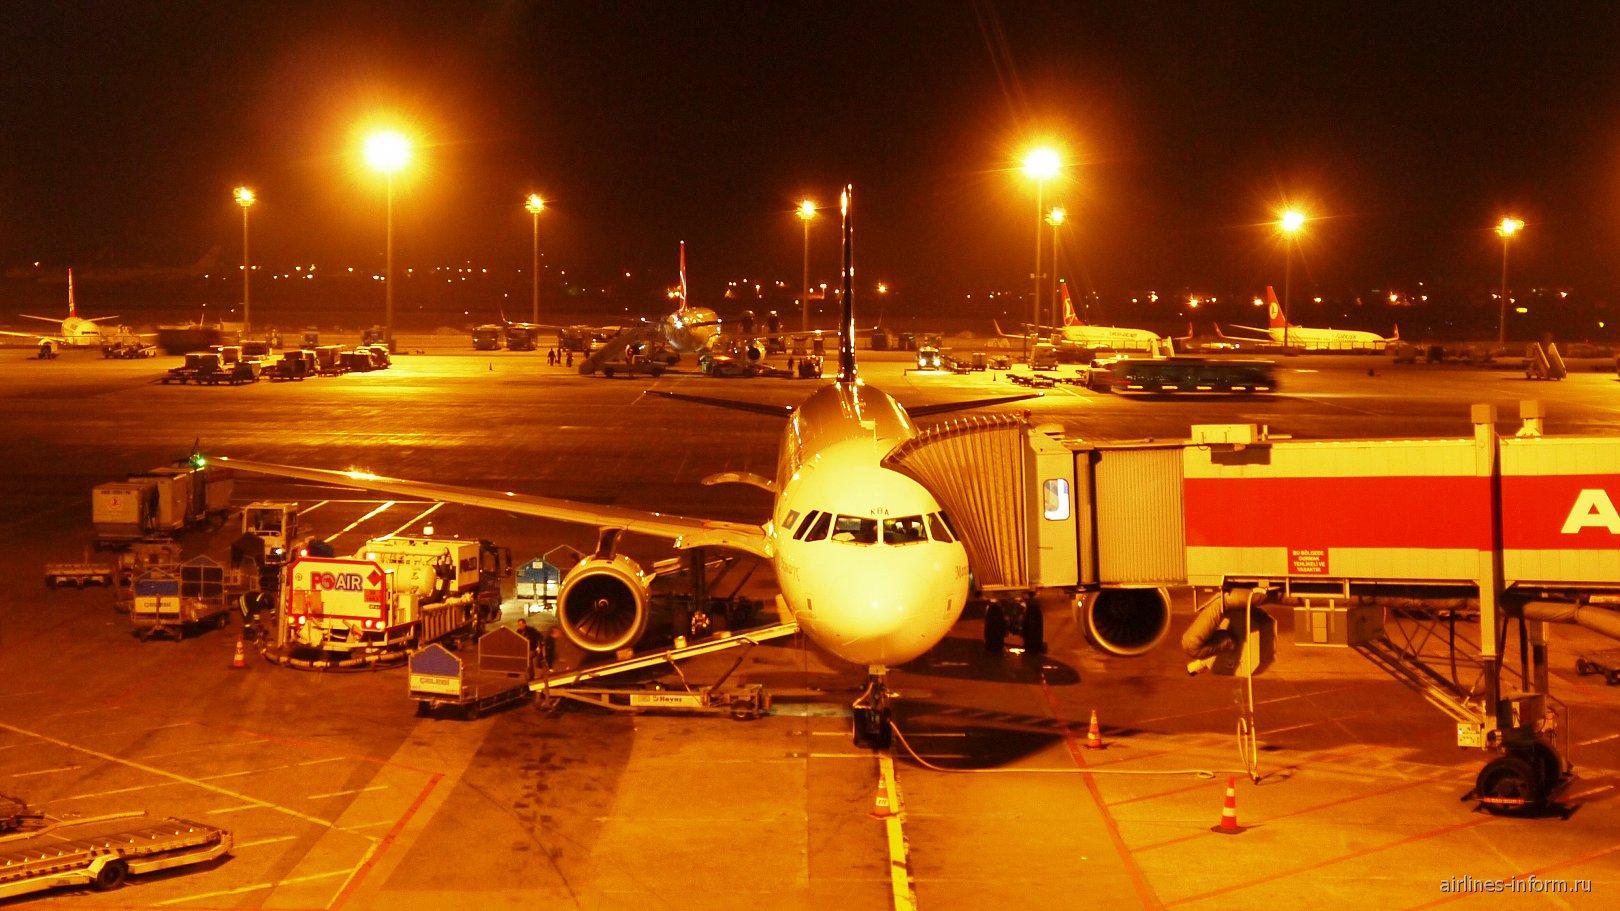 Из Ирана домой. Шираз – Стамбул – Екатеринбург на «Турецких авиалиниях», октябрь 2015 г.